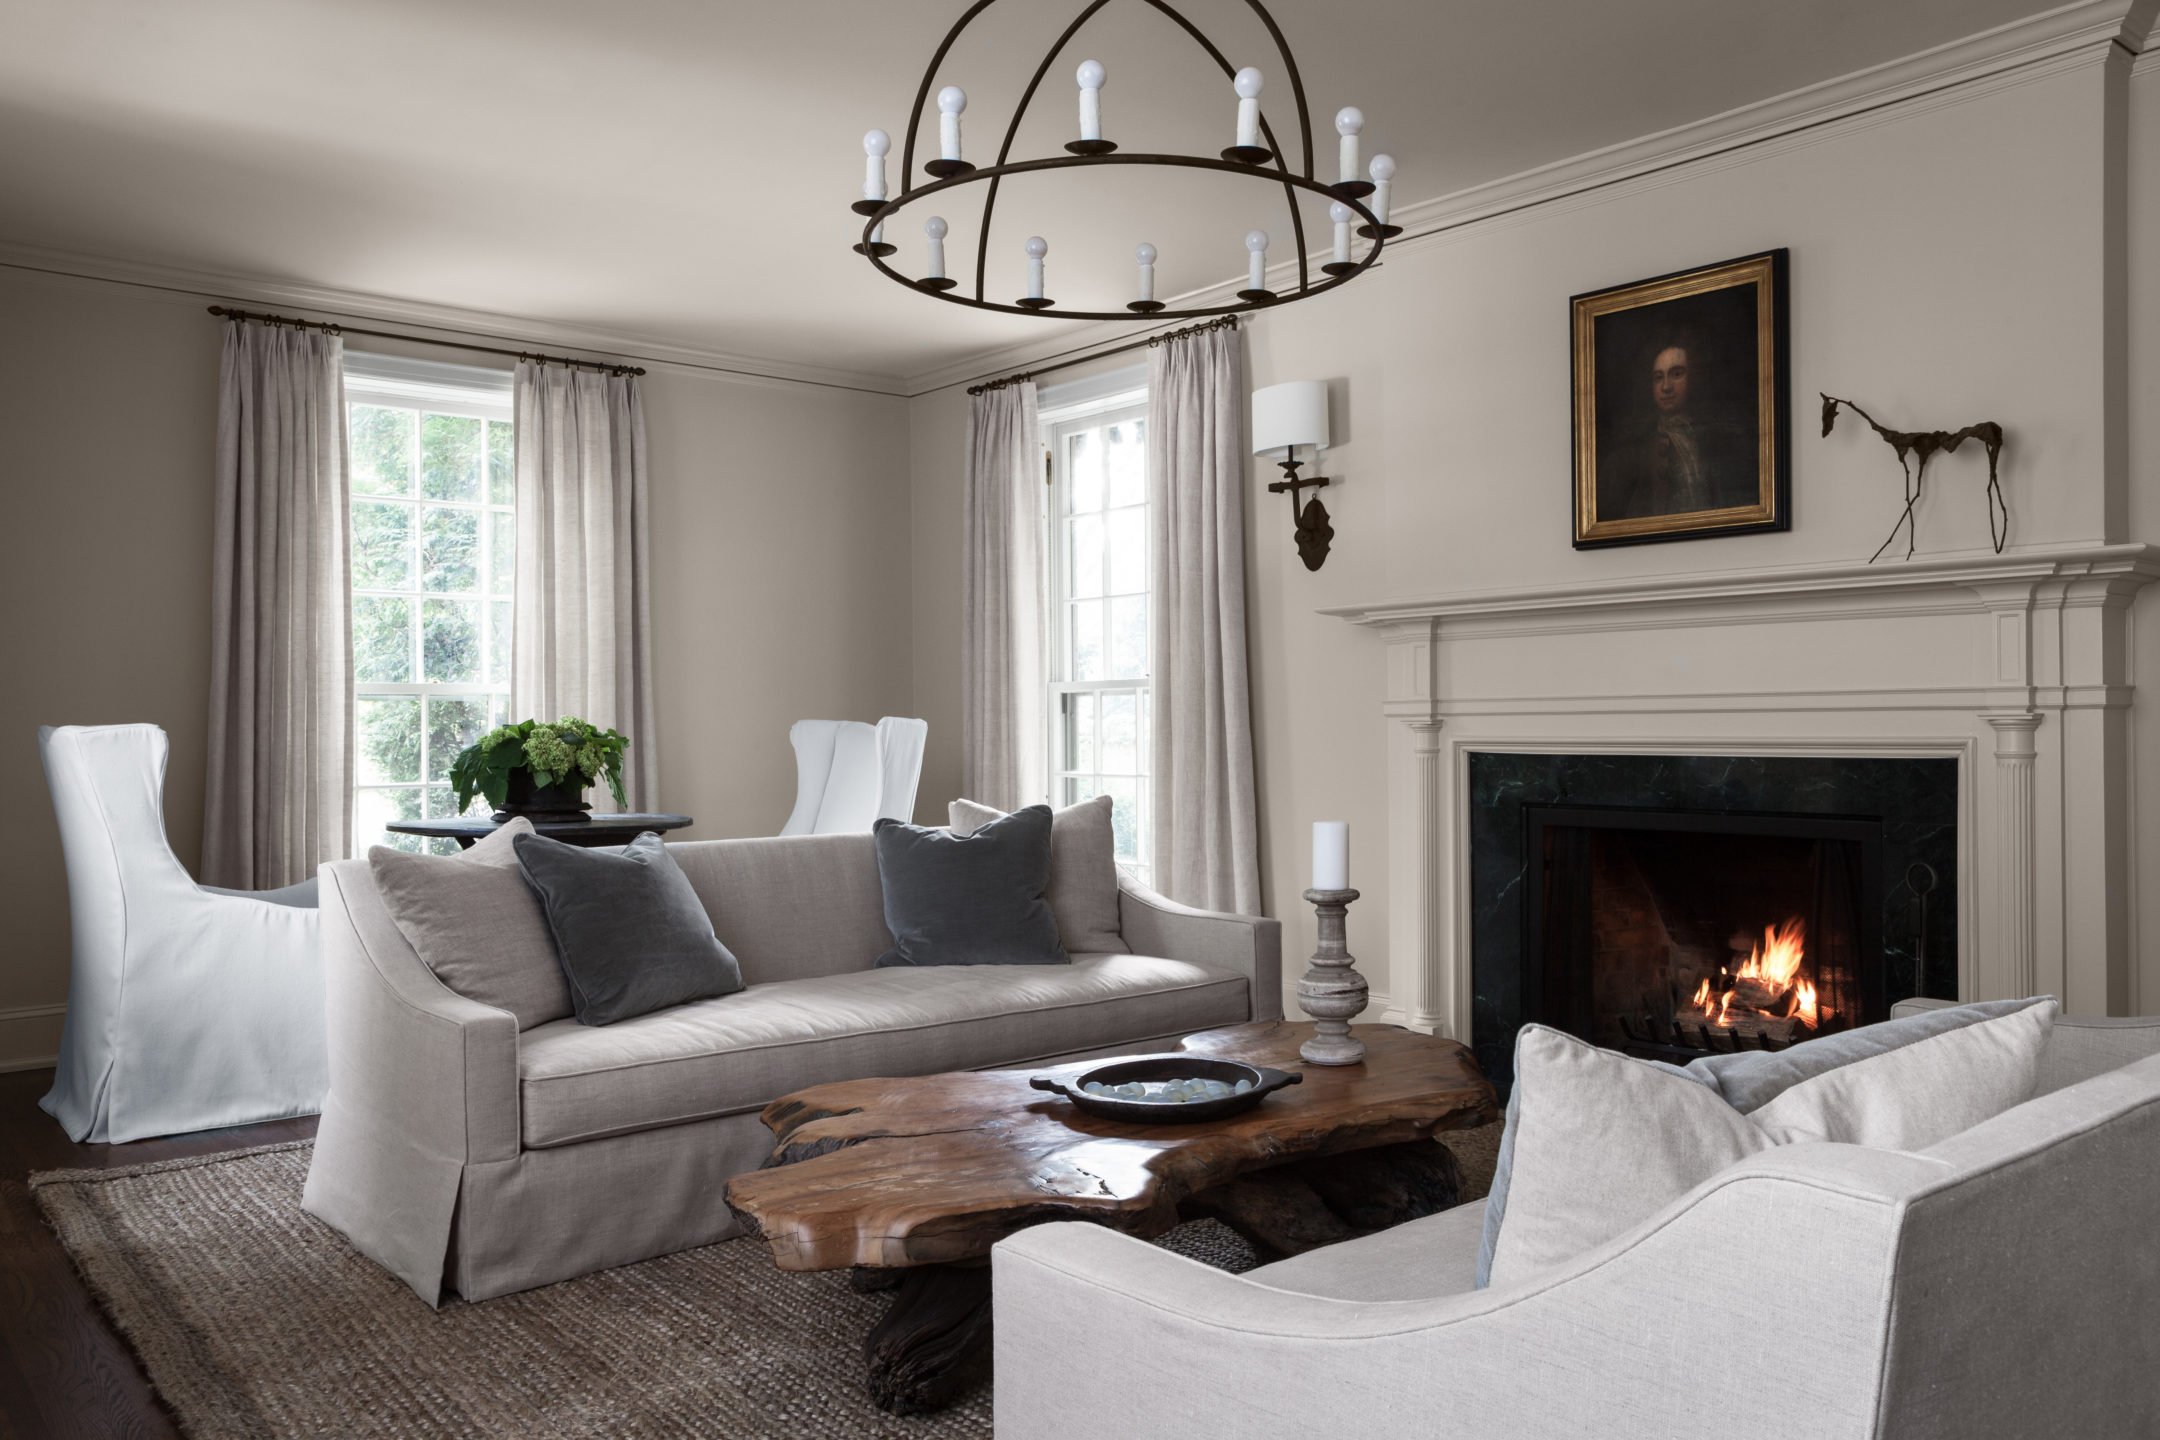 02 - Living Room